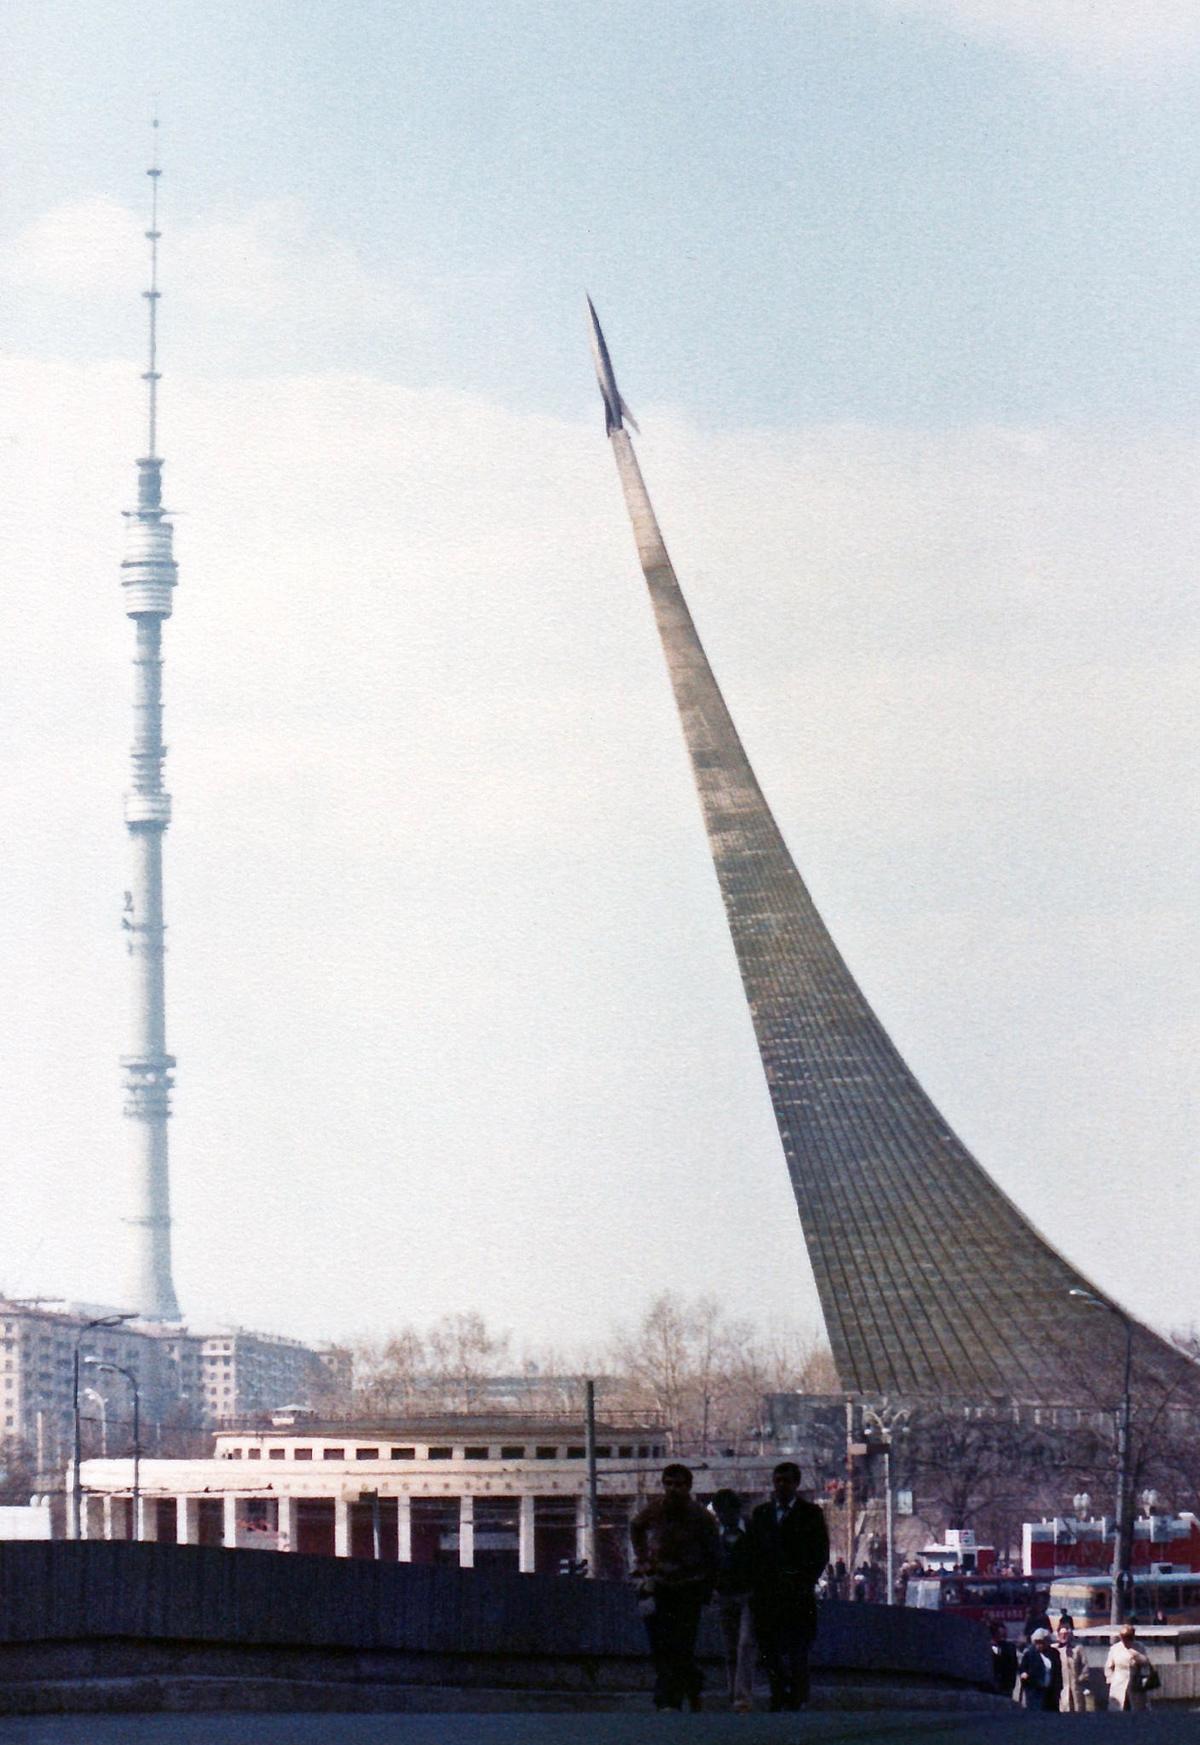 Вид на Останкинскую телебашню, Москва